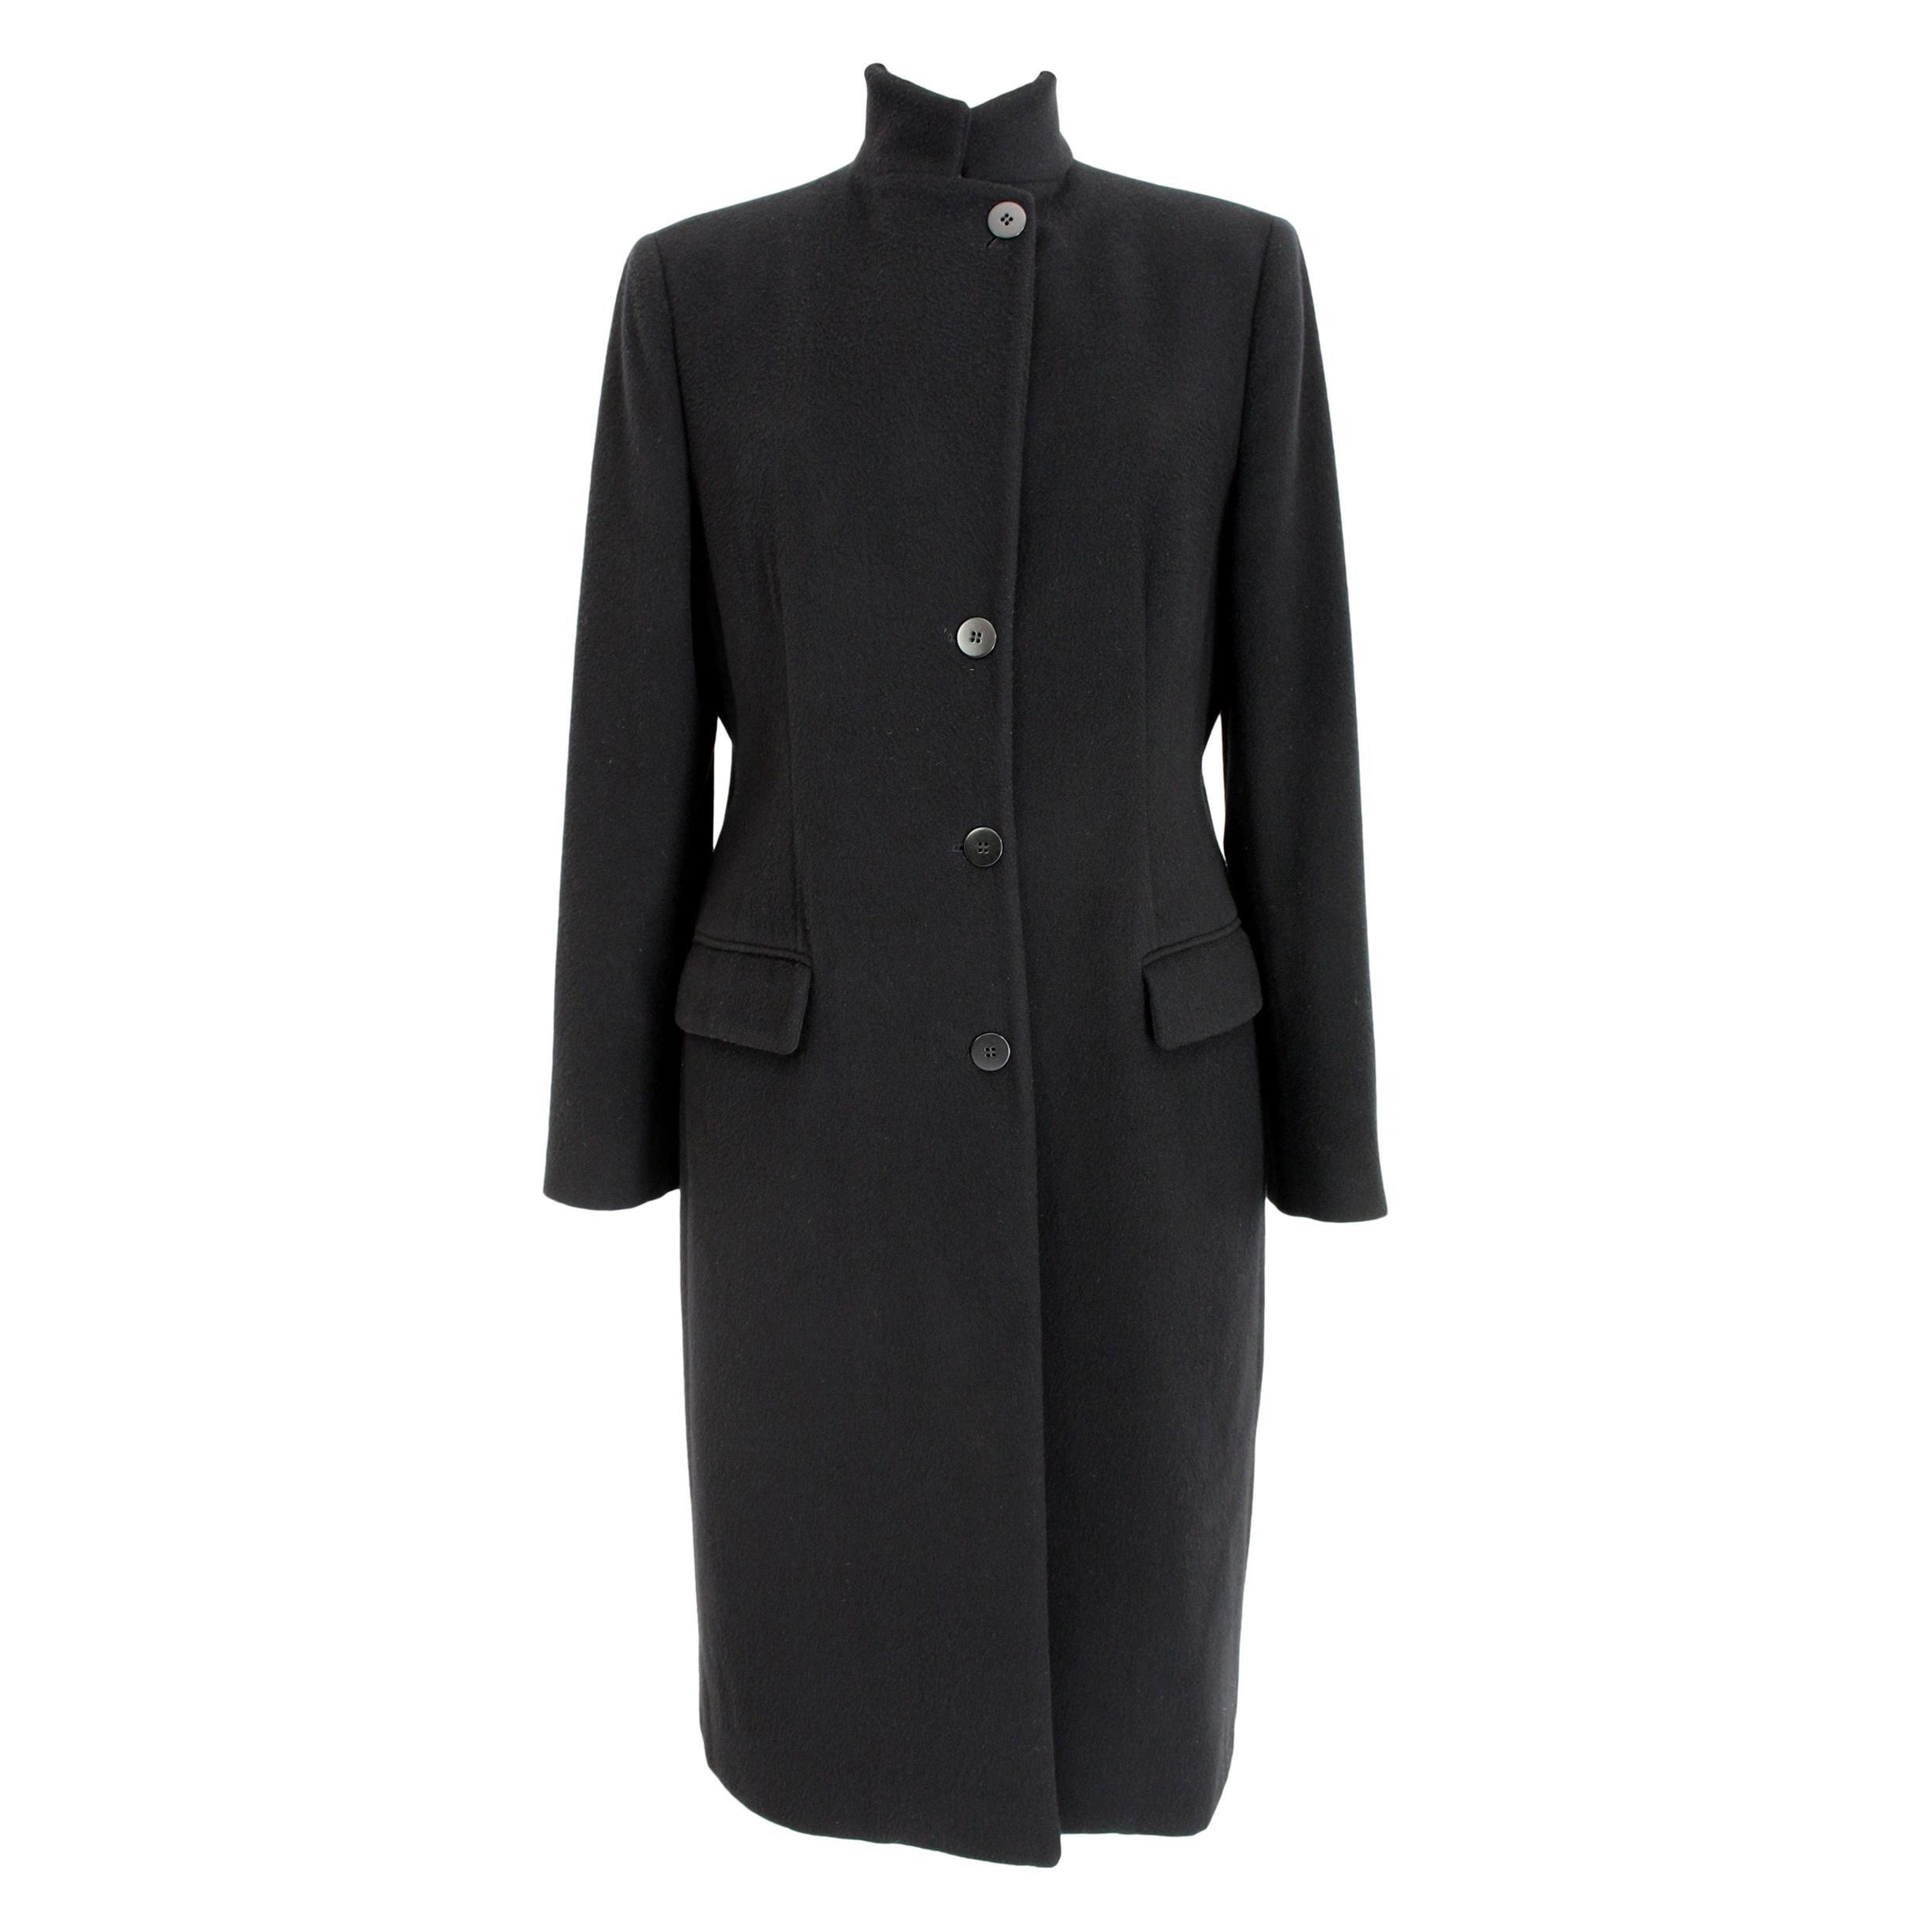 Armani Collezioni Black Soft Wool Classic Long High Collar Elegant Coat